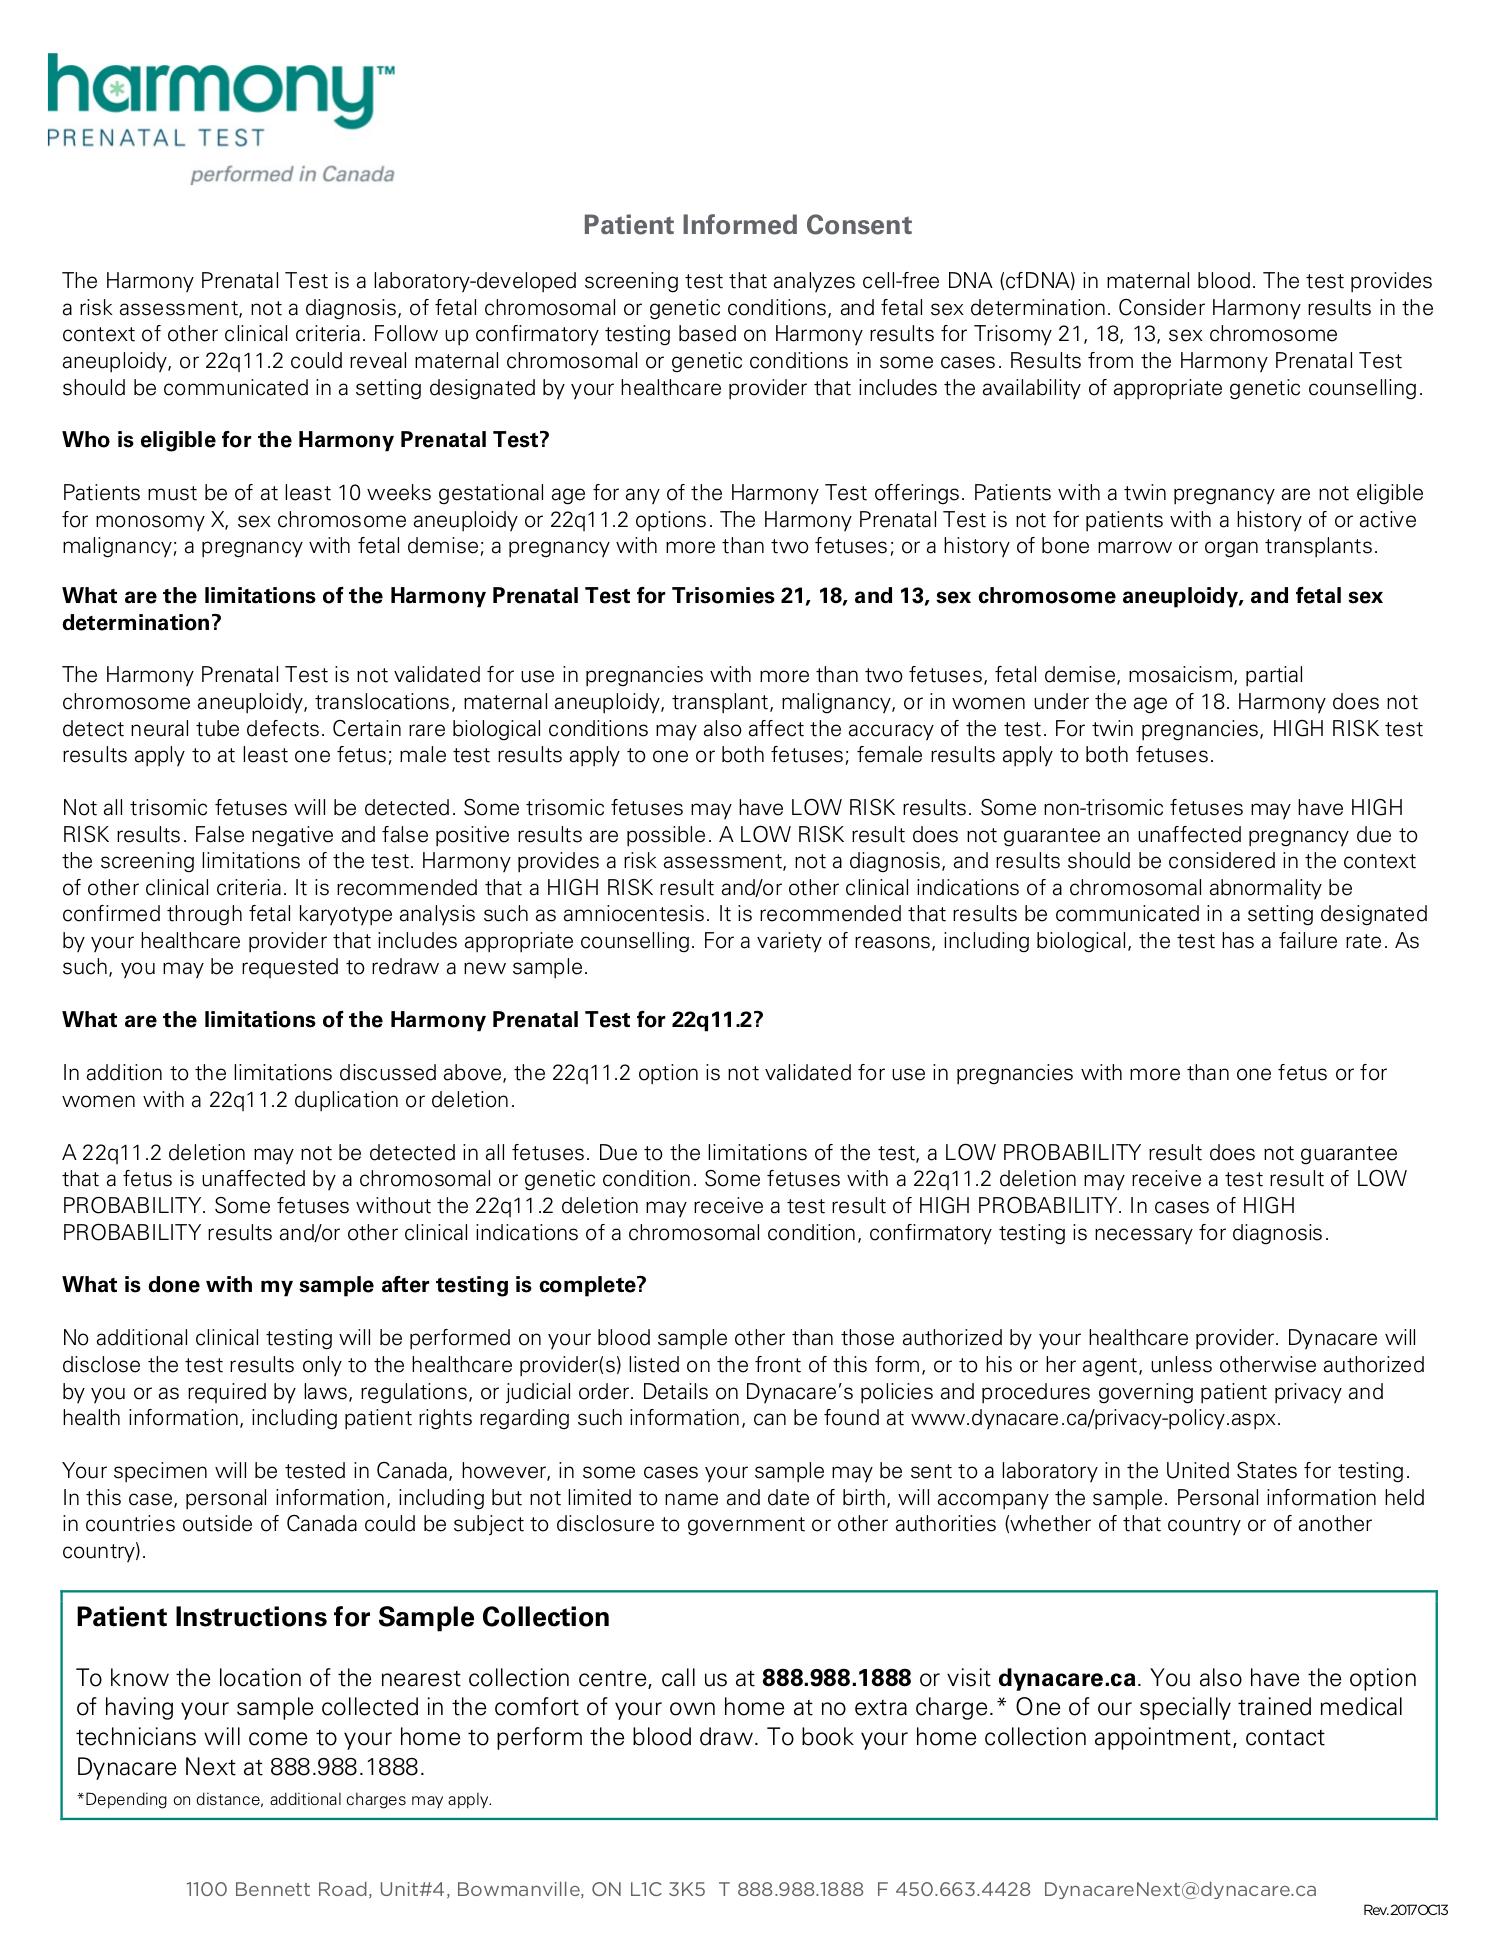 Dynacare® Harmony™ Prenatal Test Requisition : Juno EMR